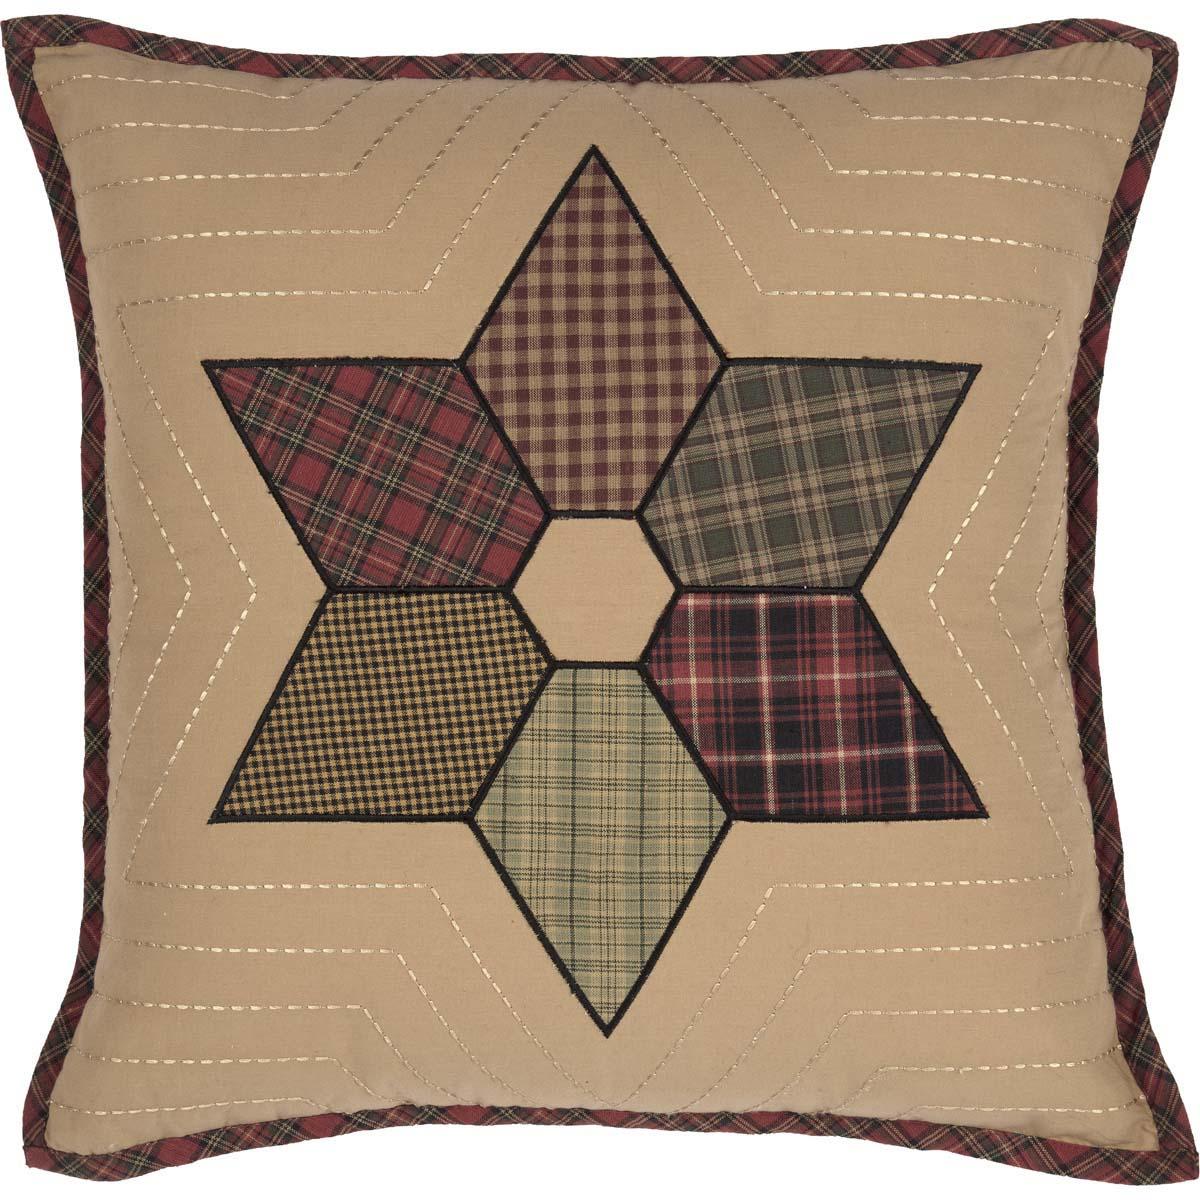 Tea Star Patchwork Pillow 18x18